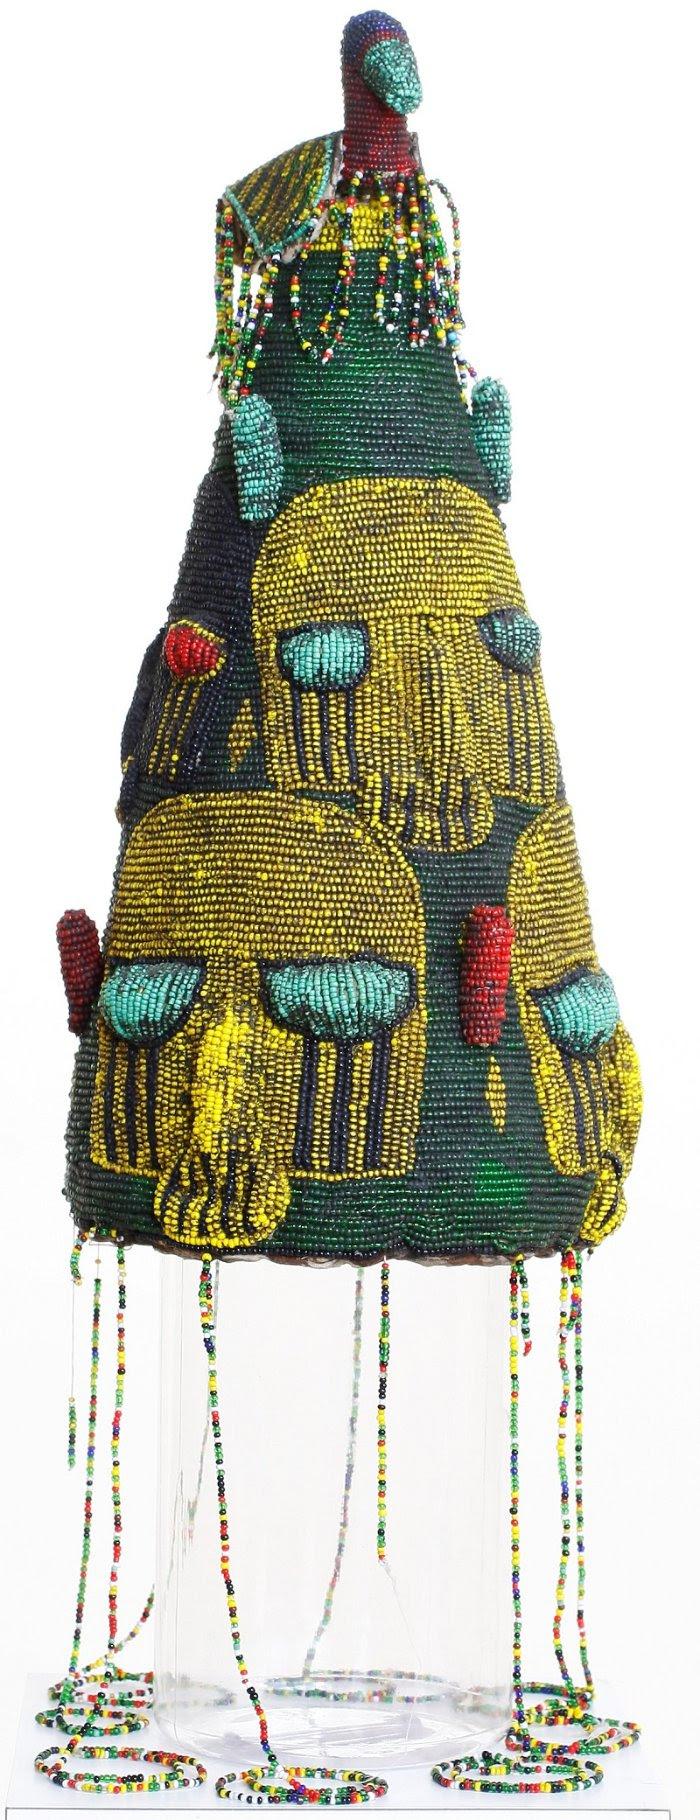 Yoruba crown (ade), no date. Beads and cloth. Gift of Mrs. June Bakalar.